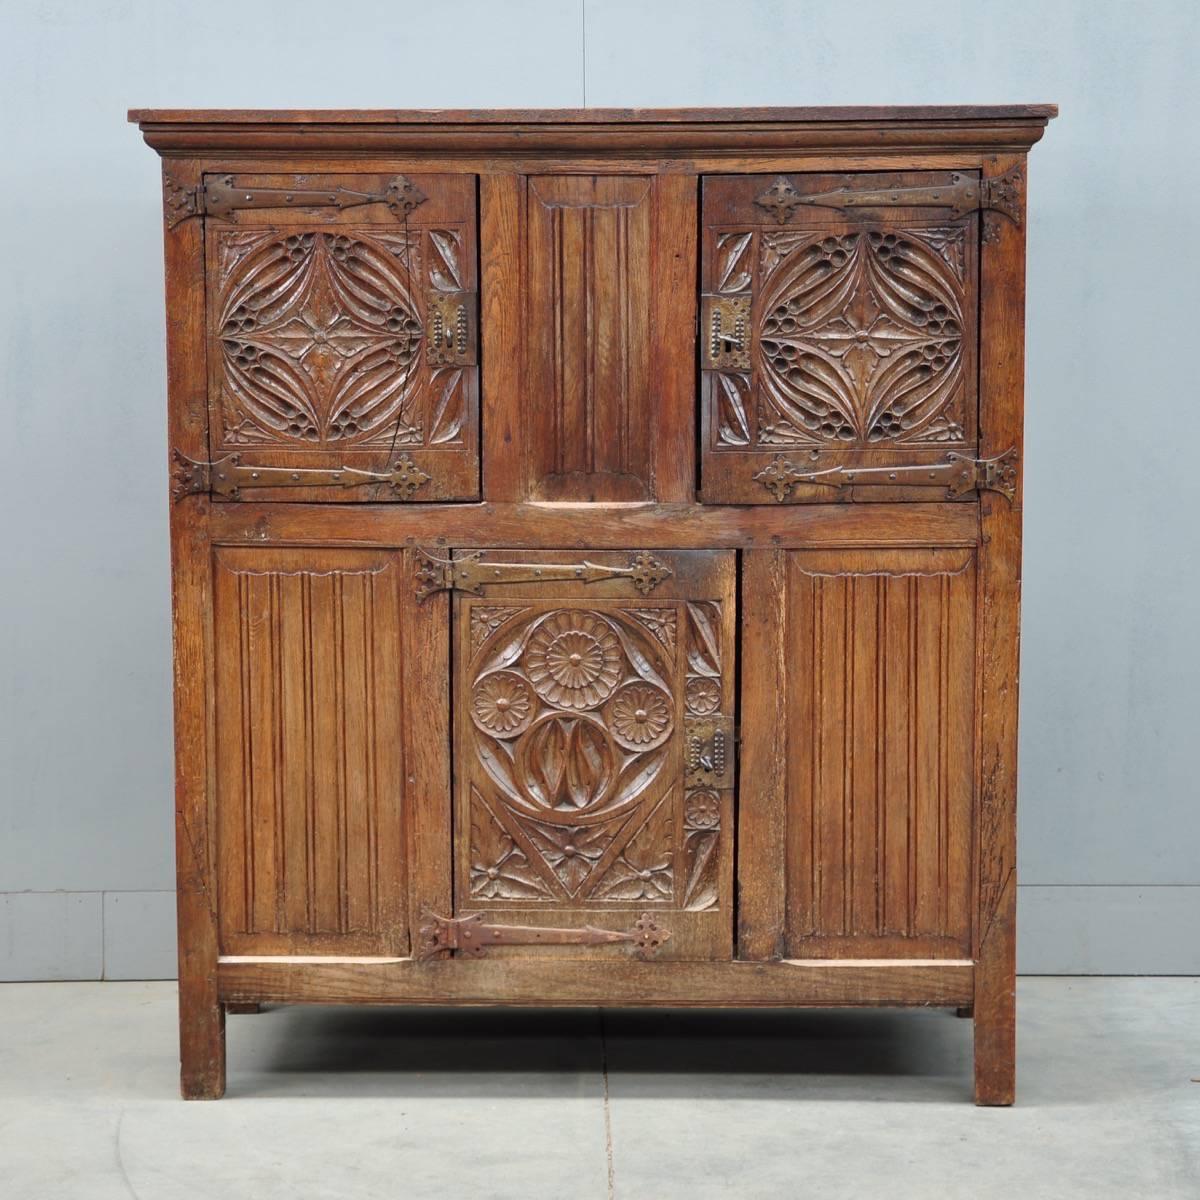 Antique Flemish cabinet   De Grande Flemish Antique Furniture - Flemish Cabinet De Grande Flemish Antique Furniture